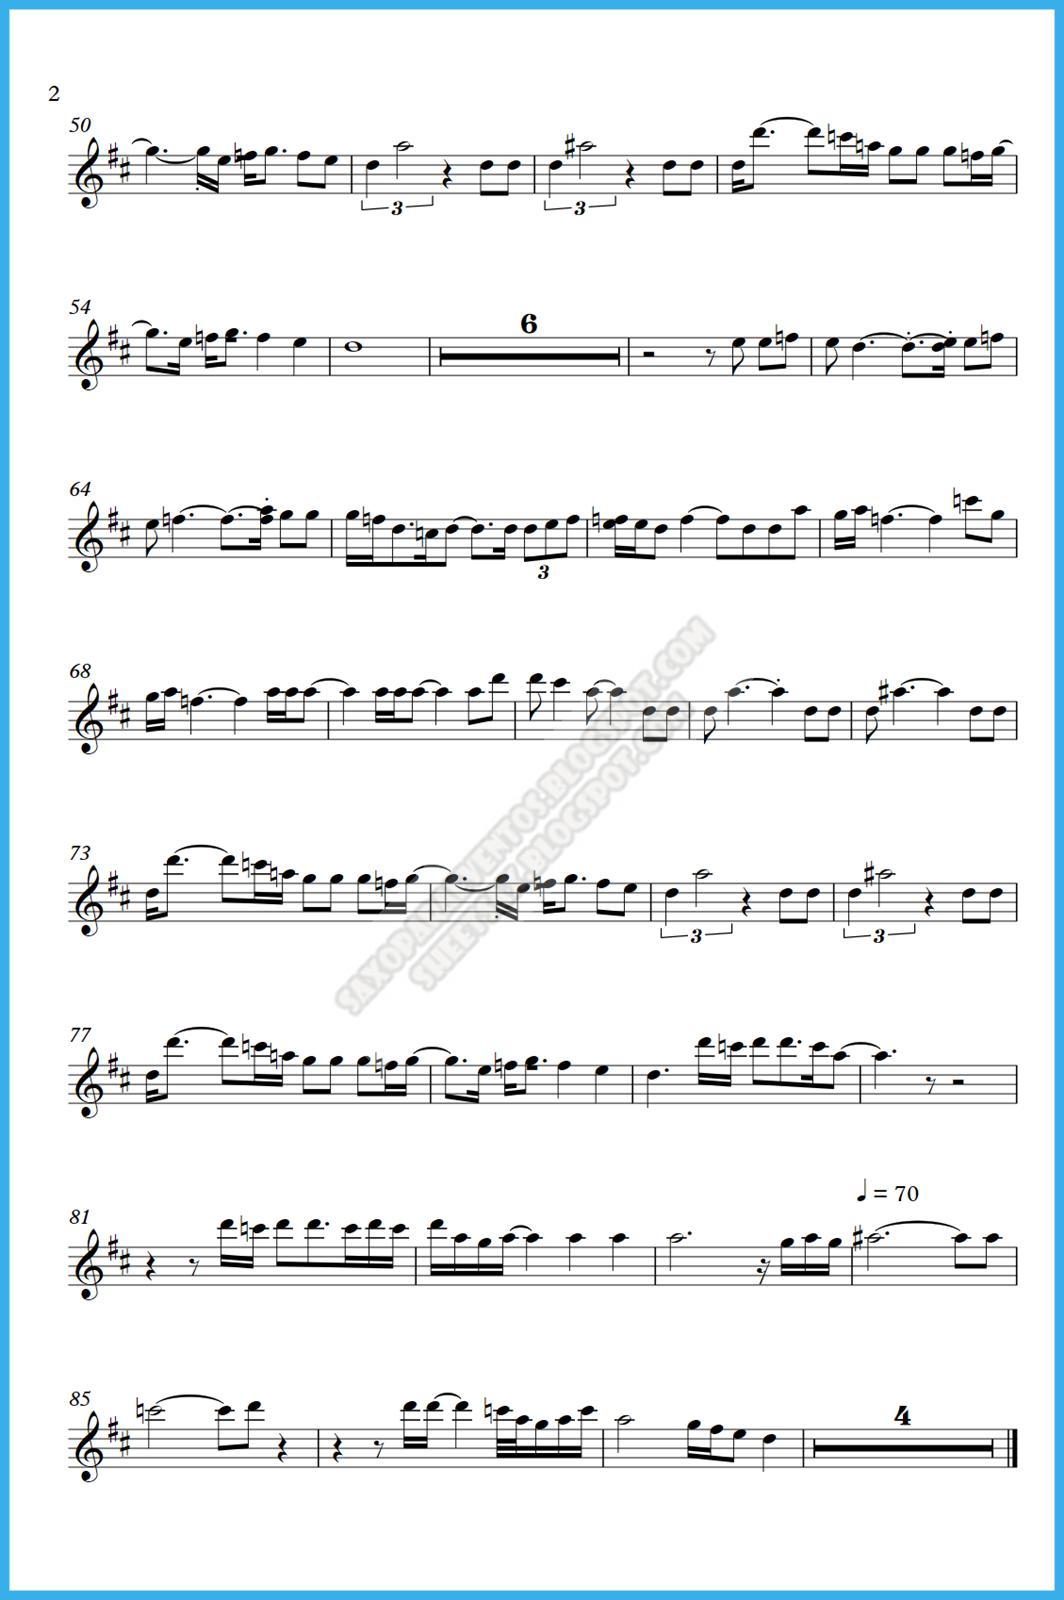 Singing in the rain sheet music myideasbedroom com